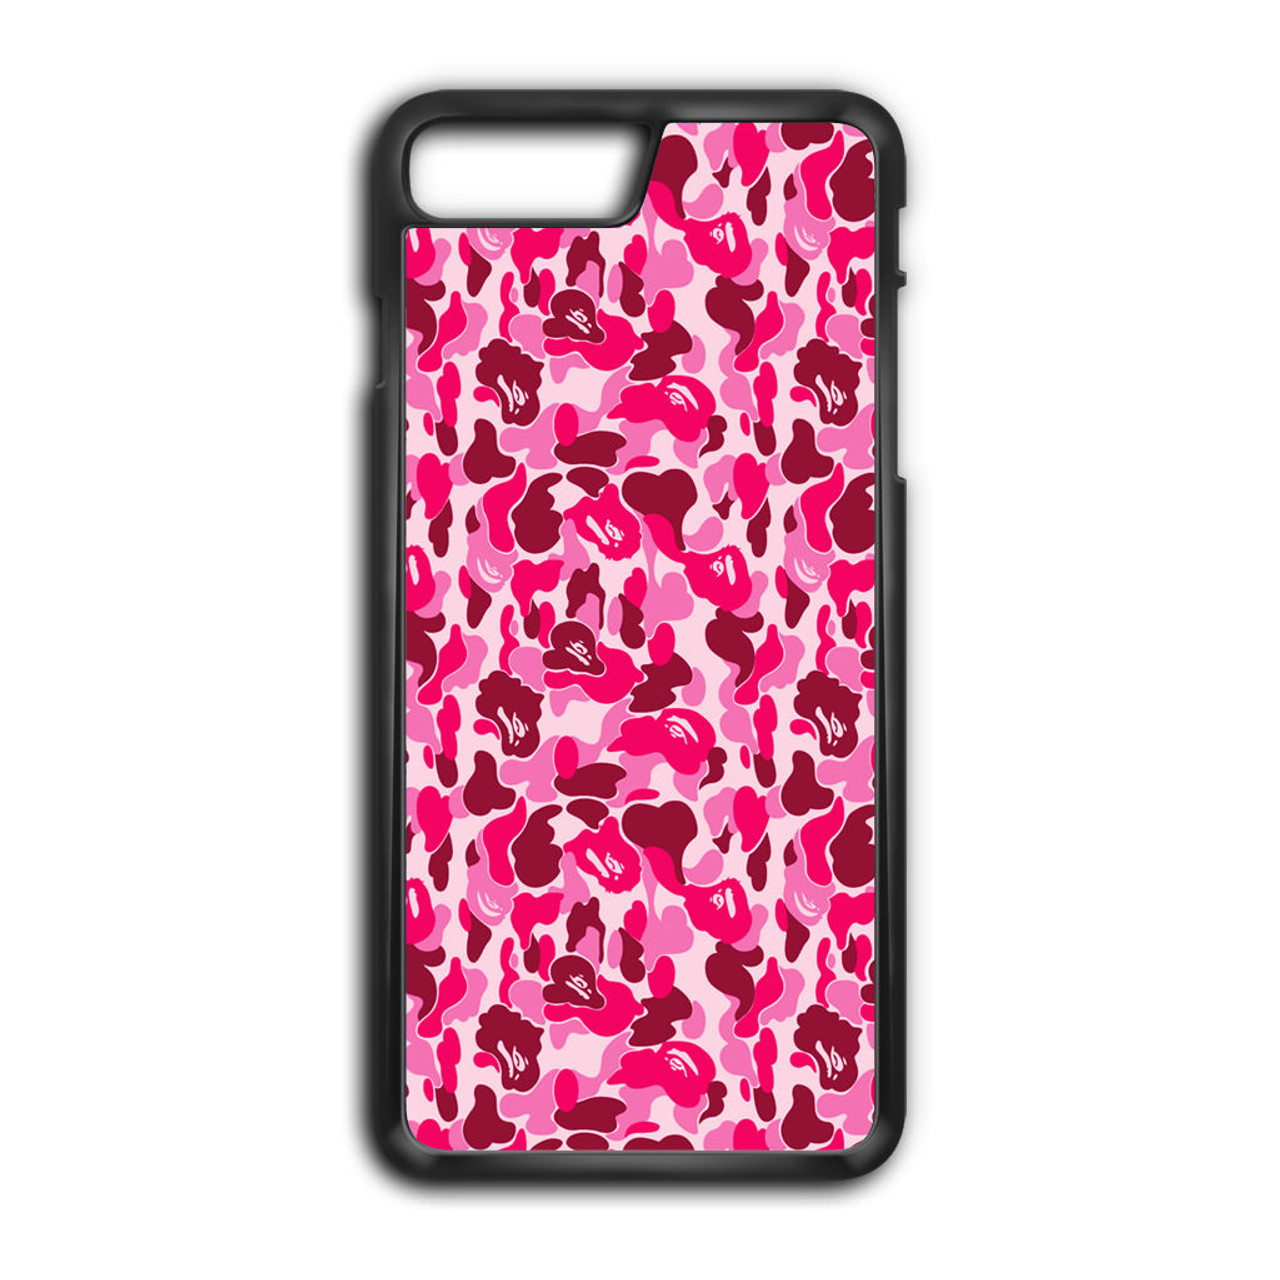 quality design 1e496 626ae Bathing Ape Bape Pink iPhone 8 Plus Case